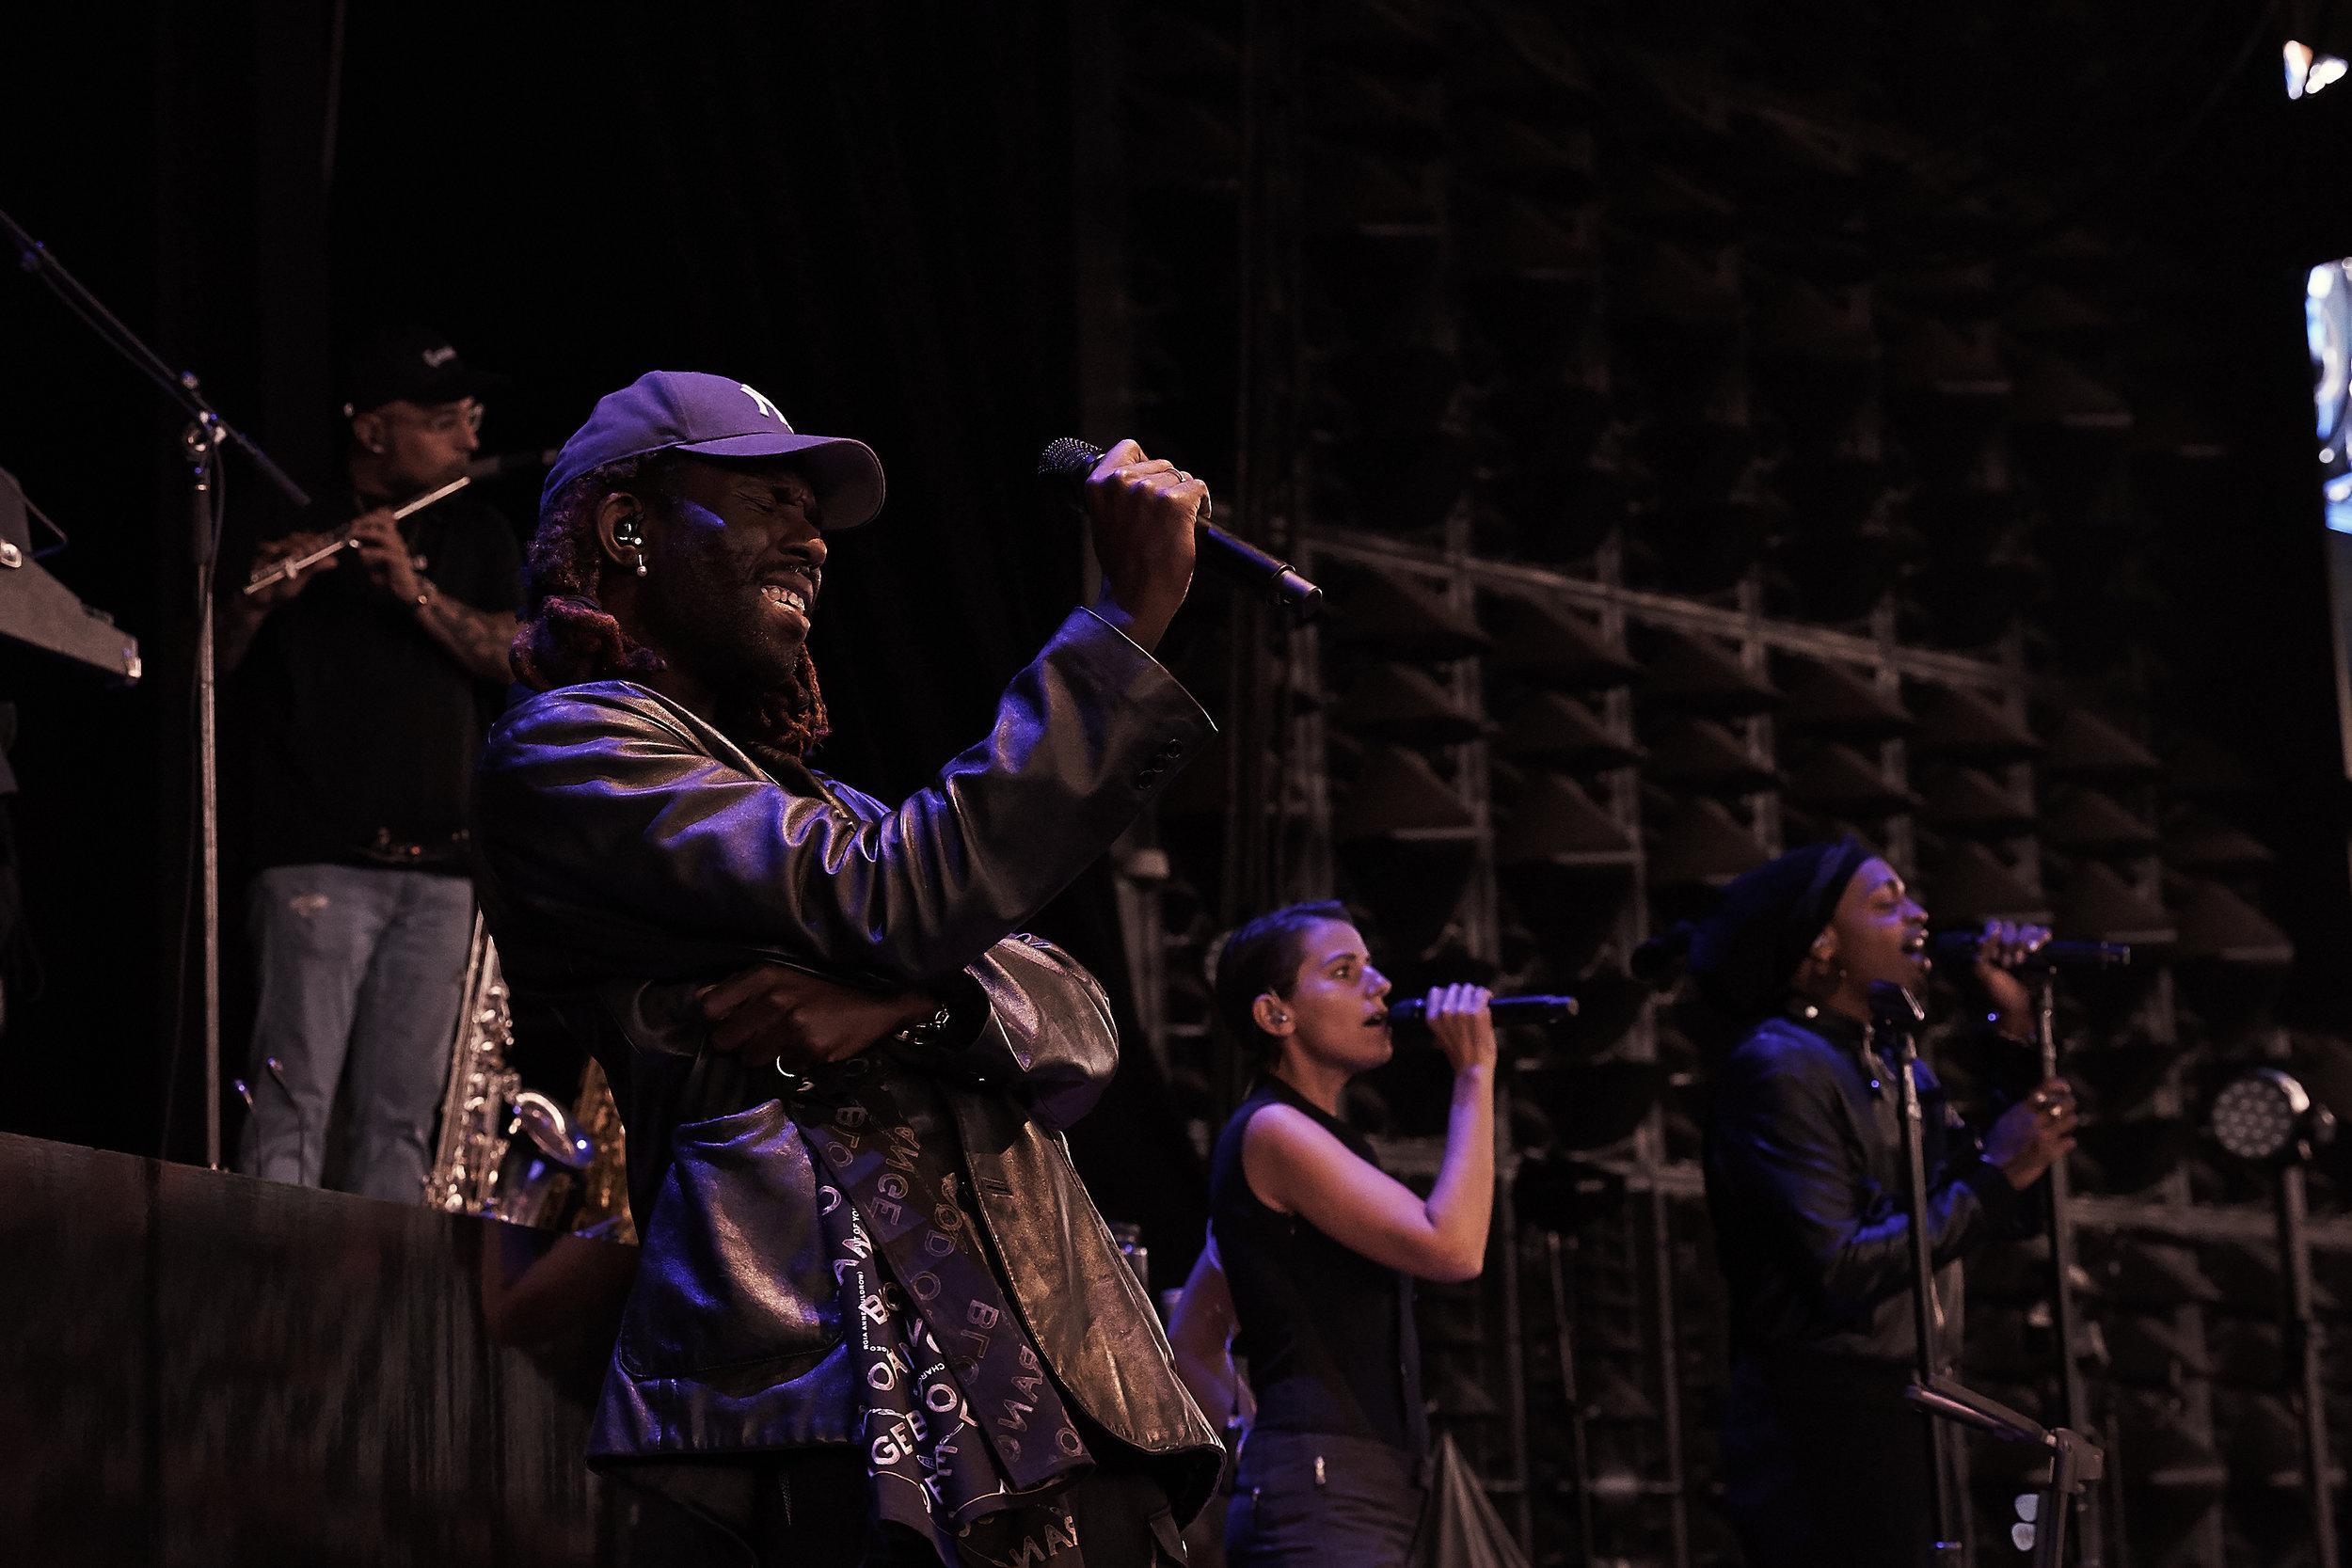 Blood Orange     // 2019-05-24 //   DTE Energy Music Theatre    -  Clarkston, MI // Photos by  Attila Hardy